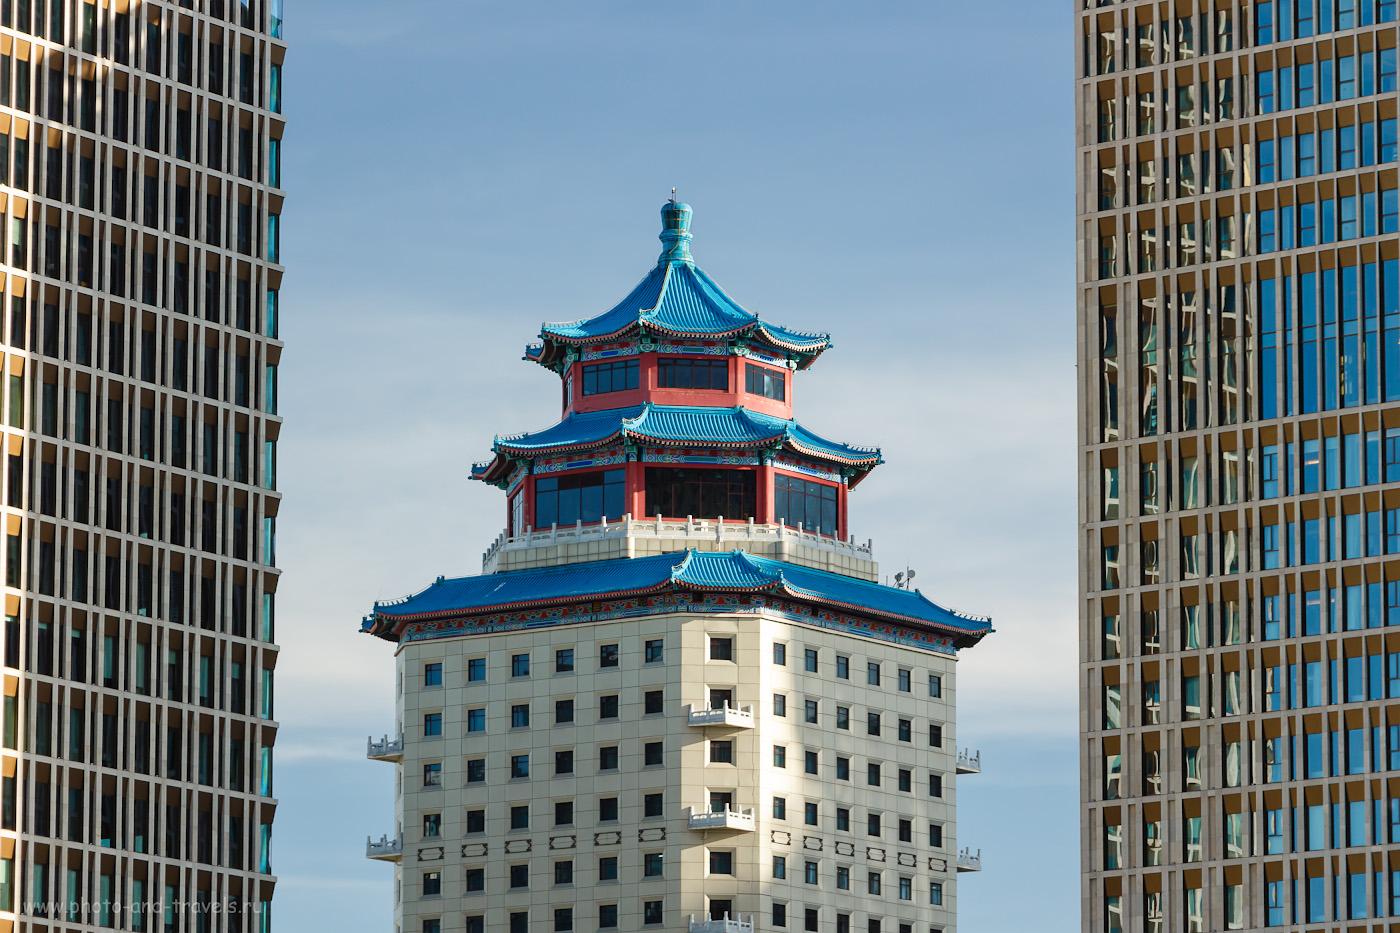 Снимок 18. Две башни бизнес центра «Talan Towers» и гостиница «Пекин Палас» на заднем плане. Отчет о прогулке по Астане. 1/250, +0.3, 5.6, 200, 109.